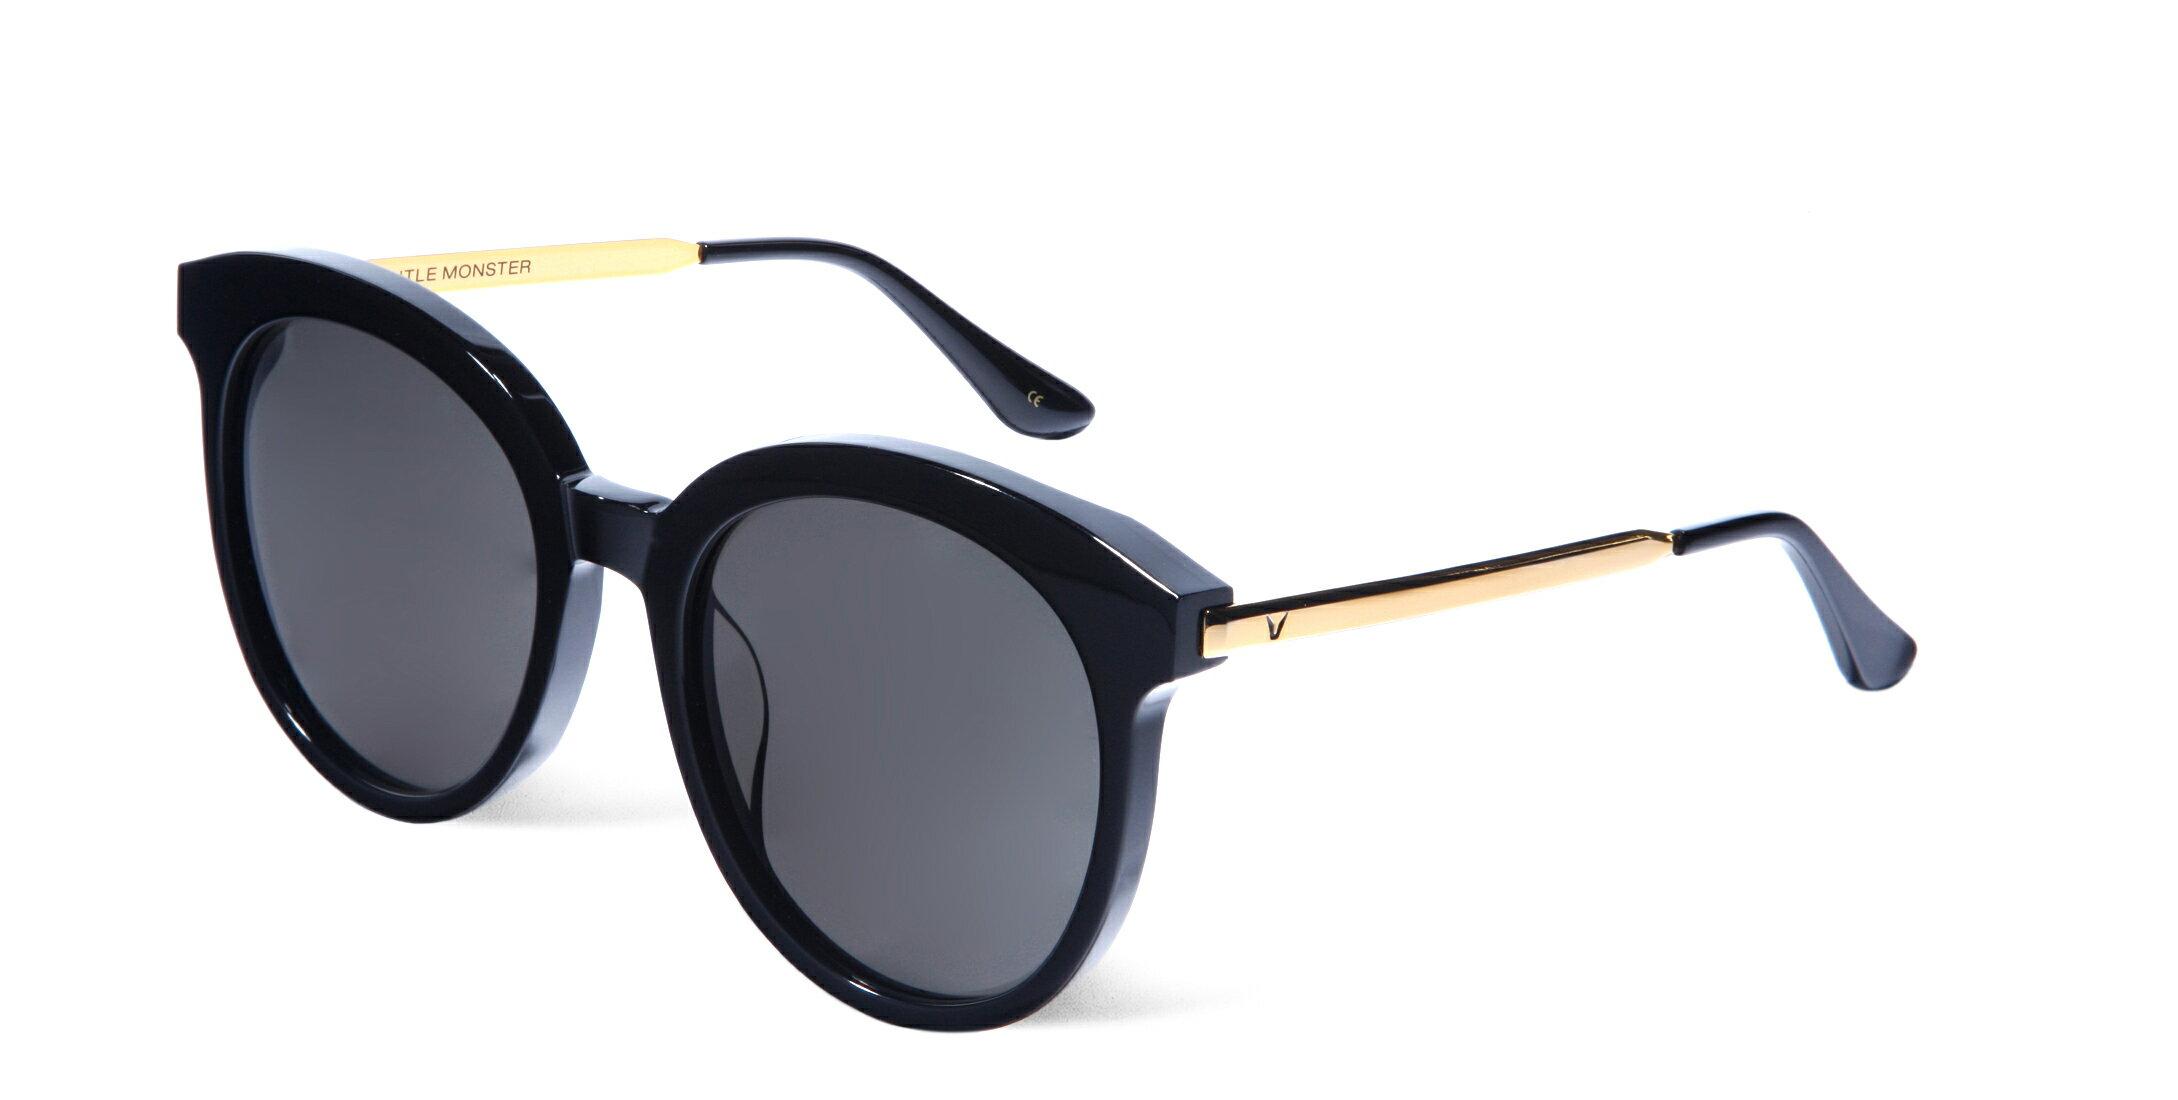 【VOGUE時尚】GENTLE MONSTER精品太陽眼鏡 #LOVESOME 01 GOLD @K startree首爾星星樹